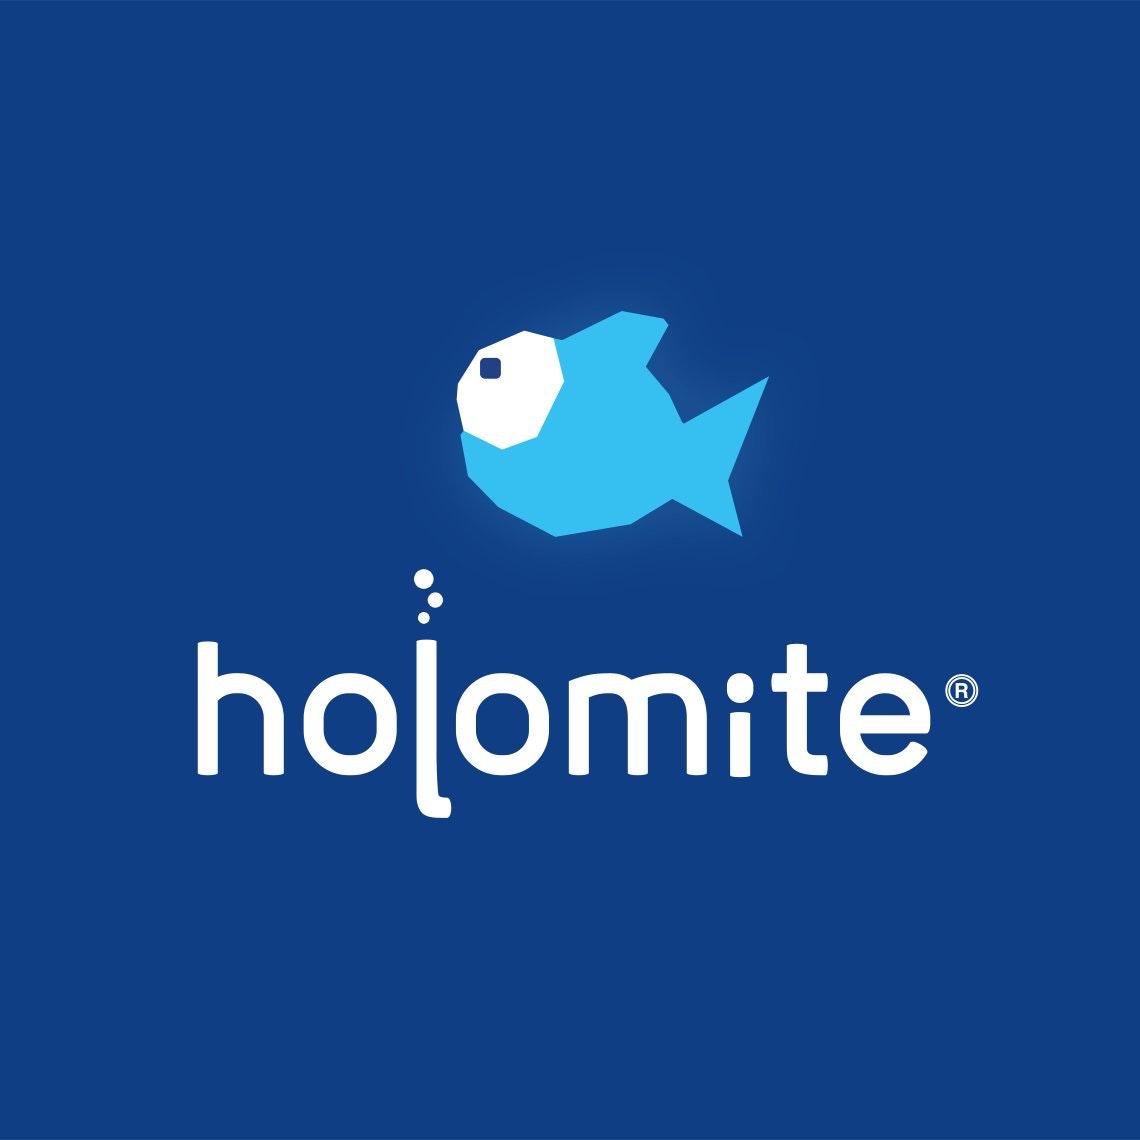 Holomite